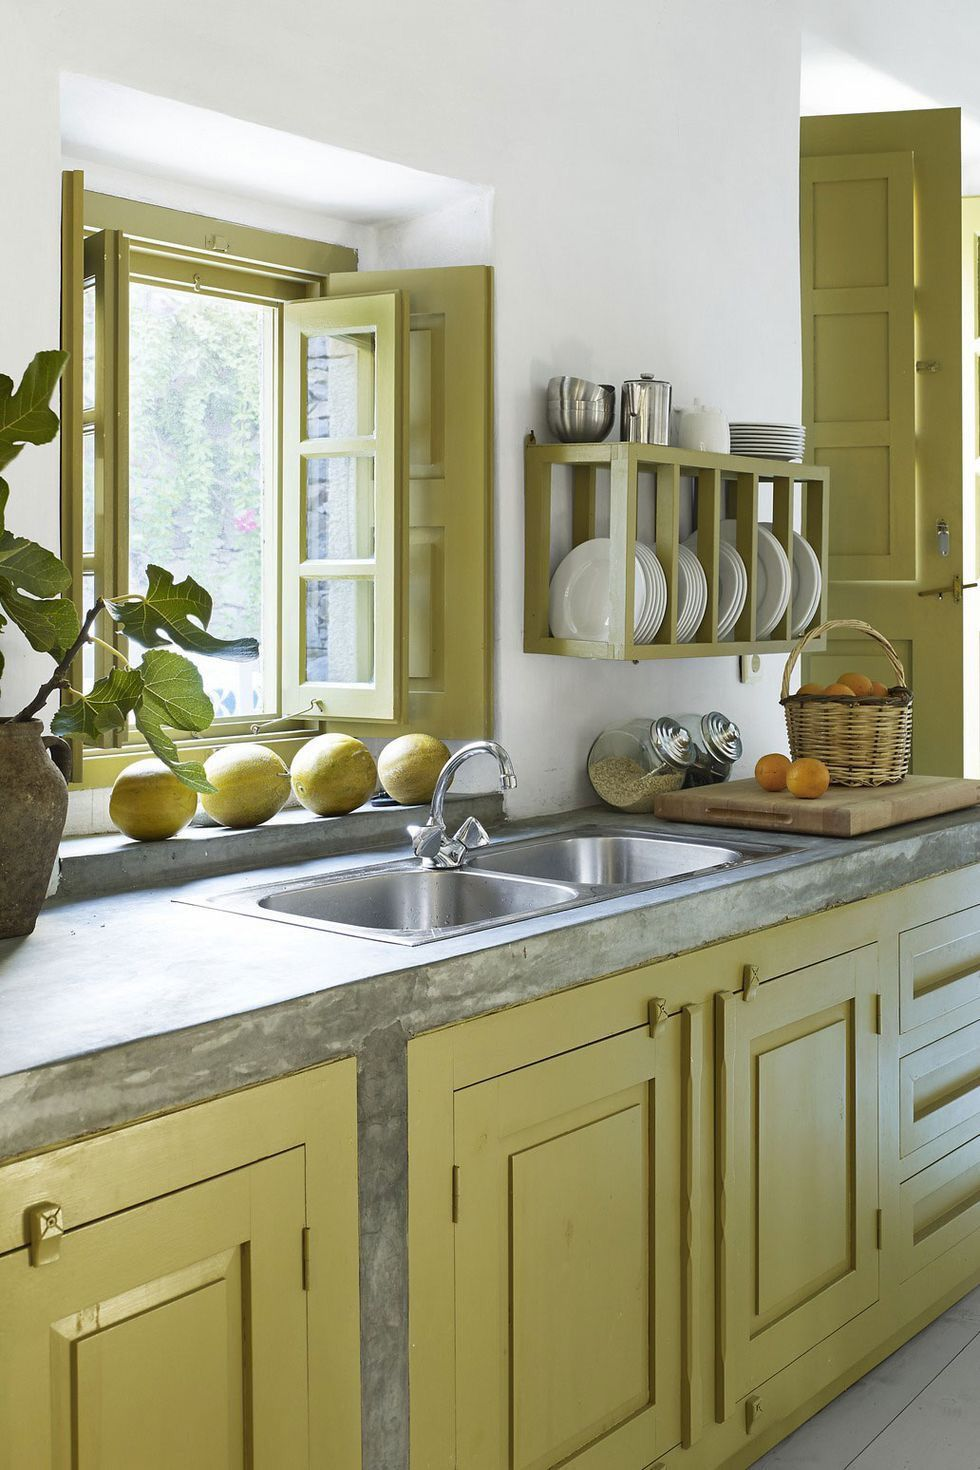 Beautiful Green image by Sharon Horton Small kitchen